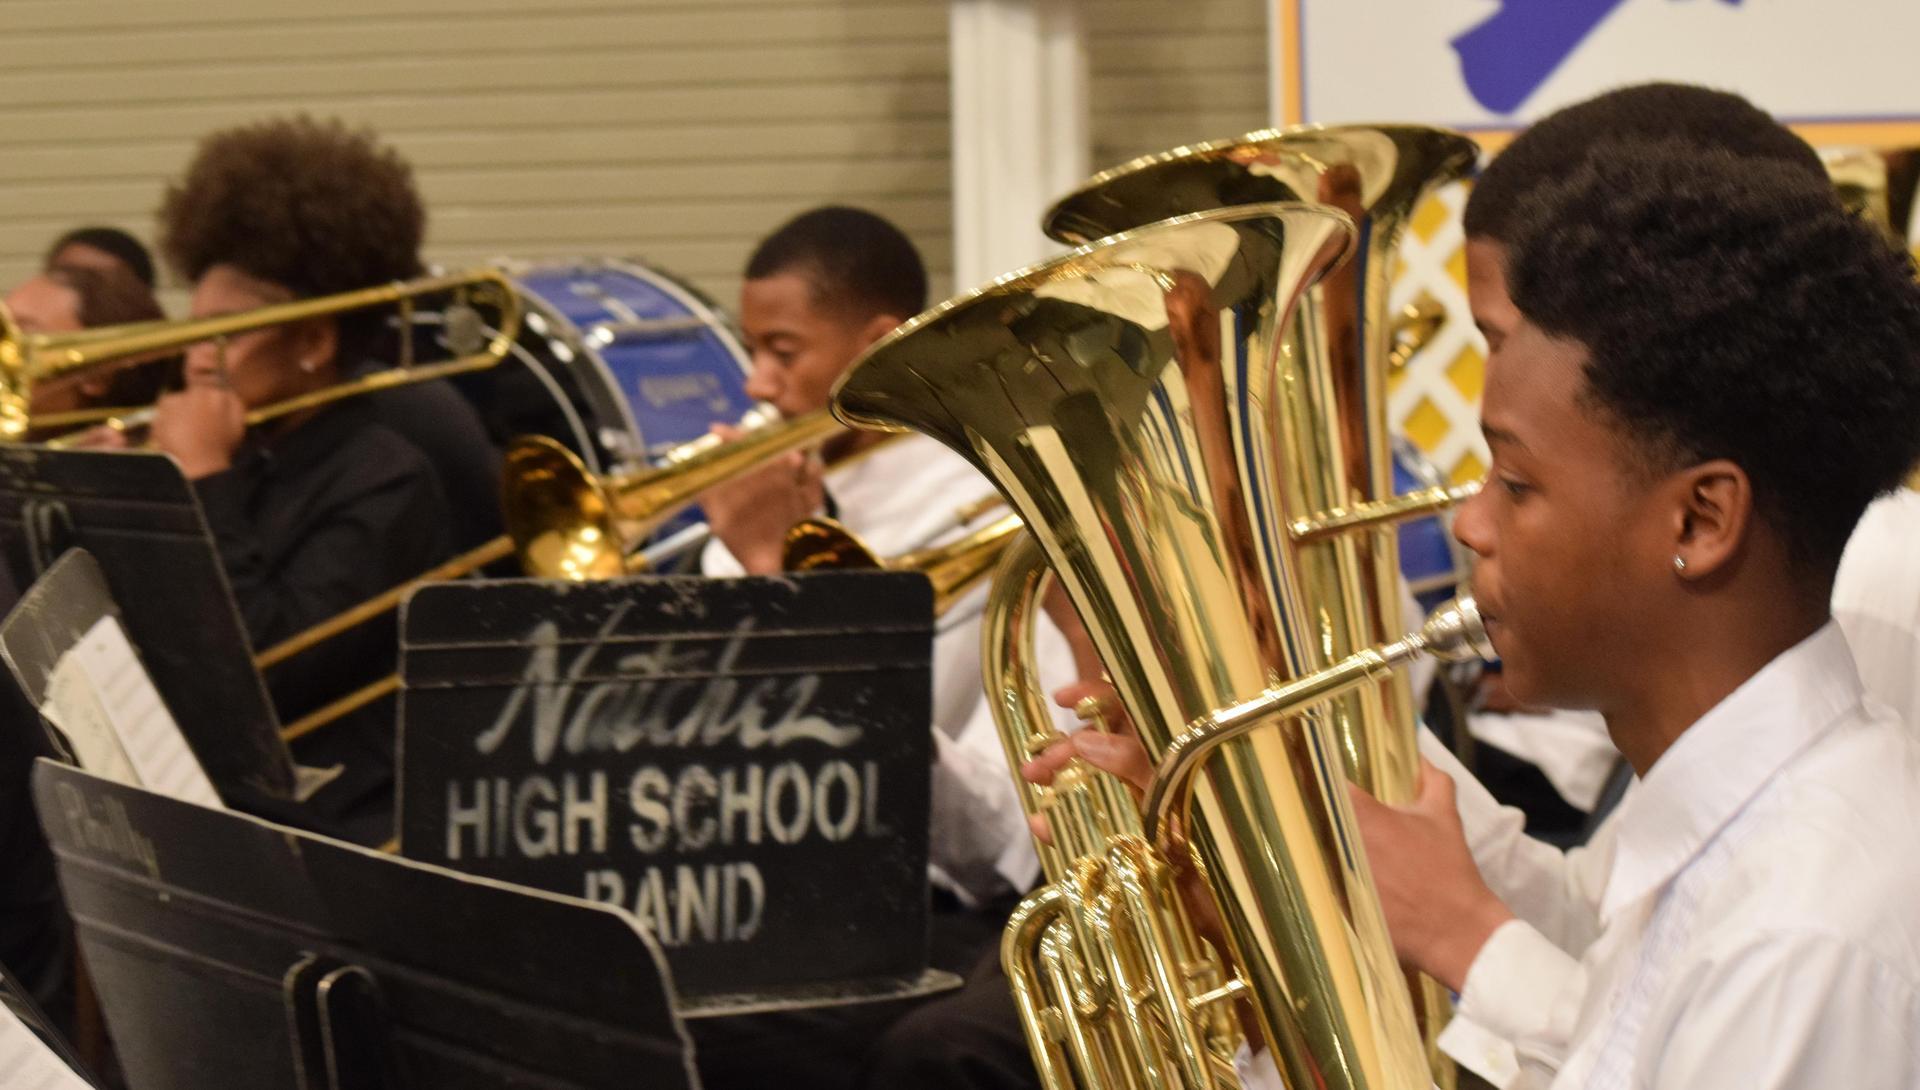 Natchez High School Band 2018-2019